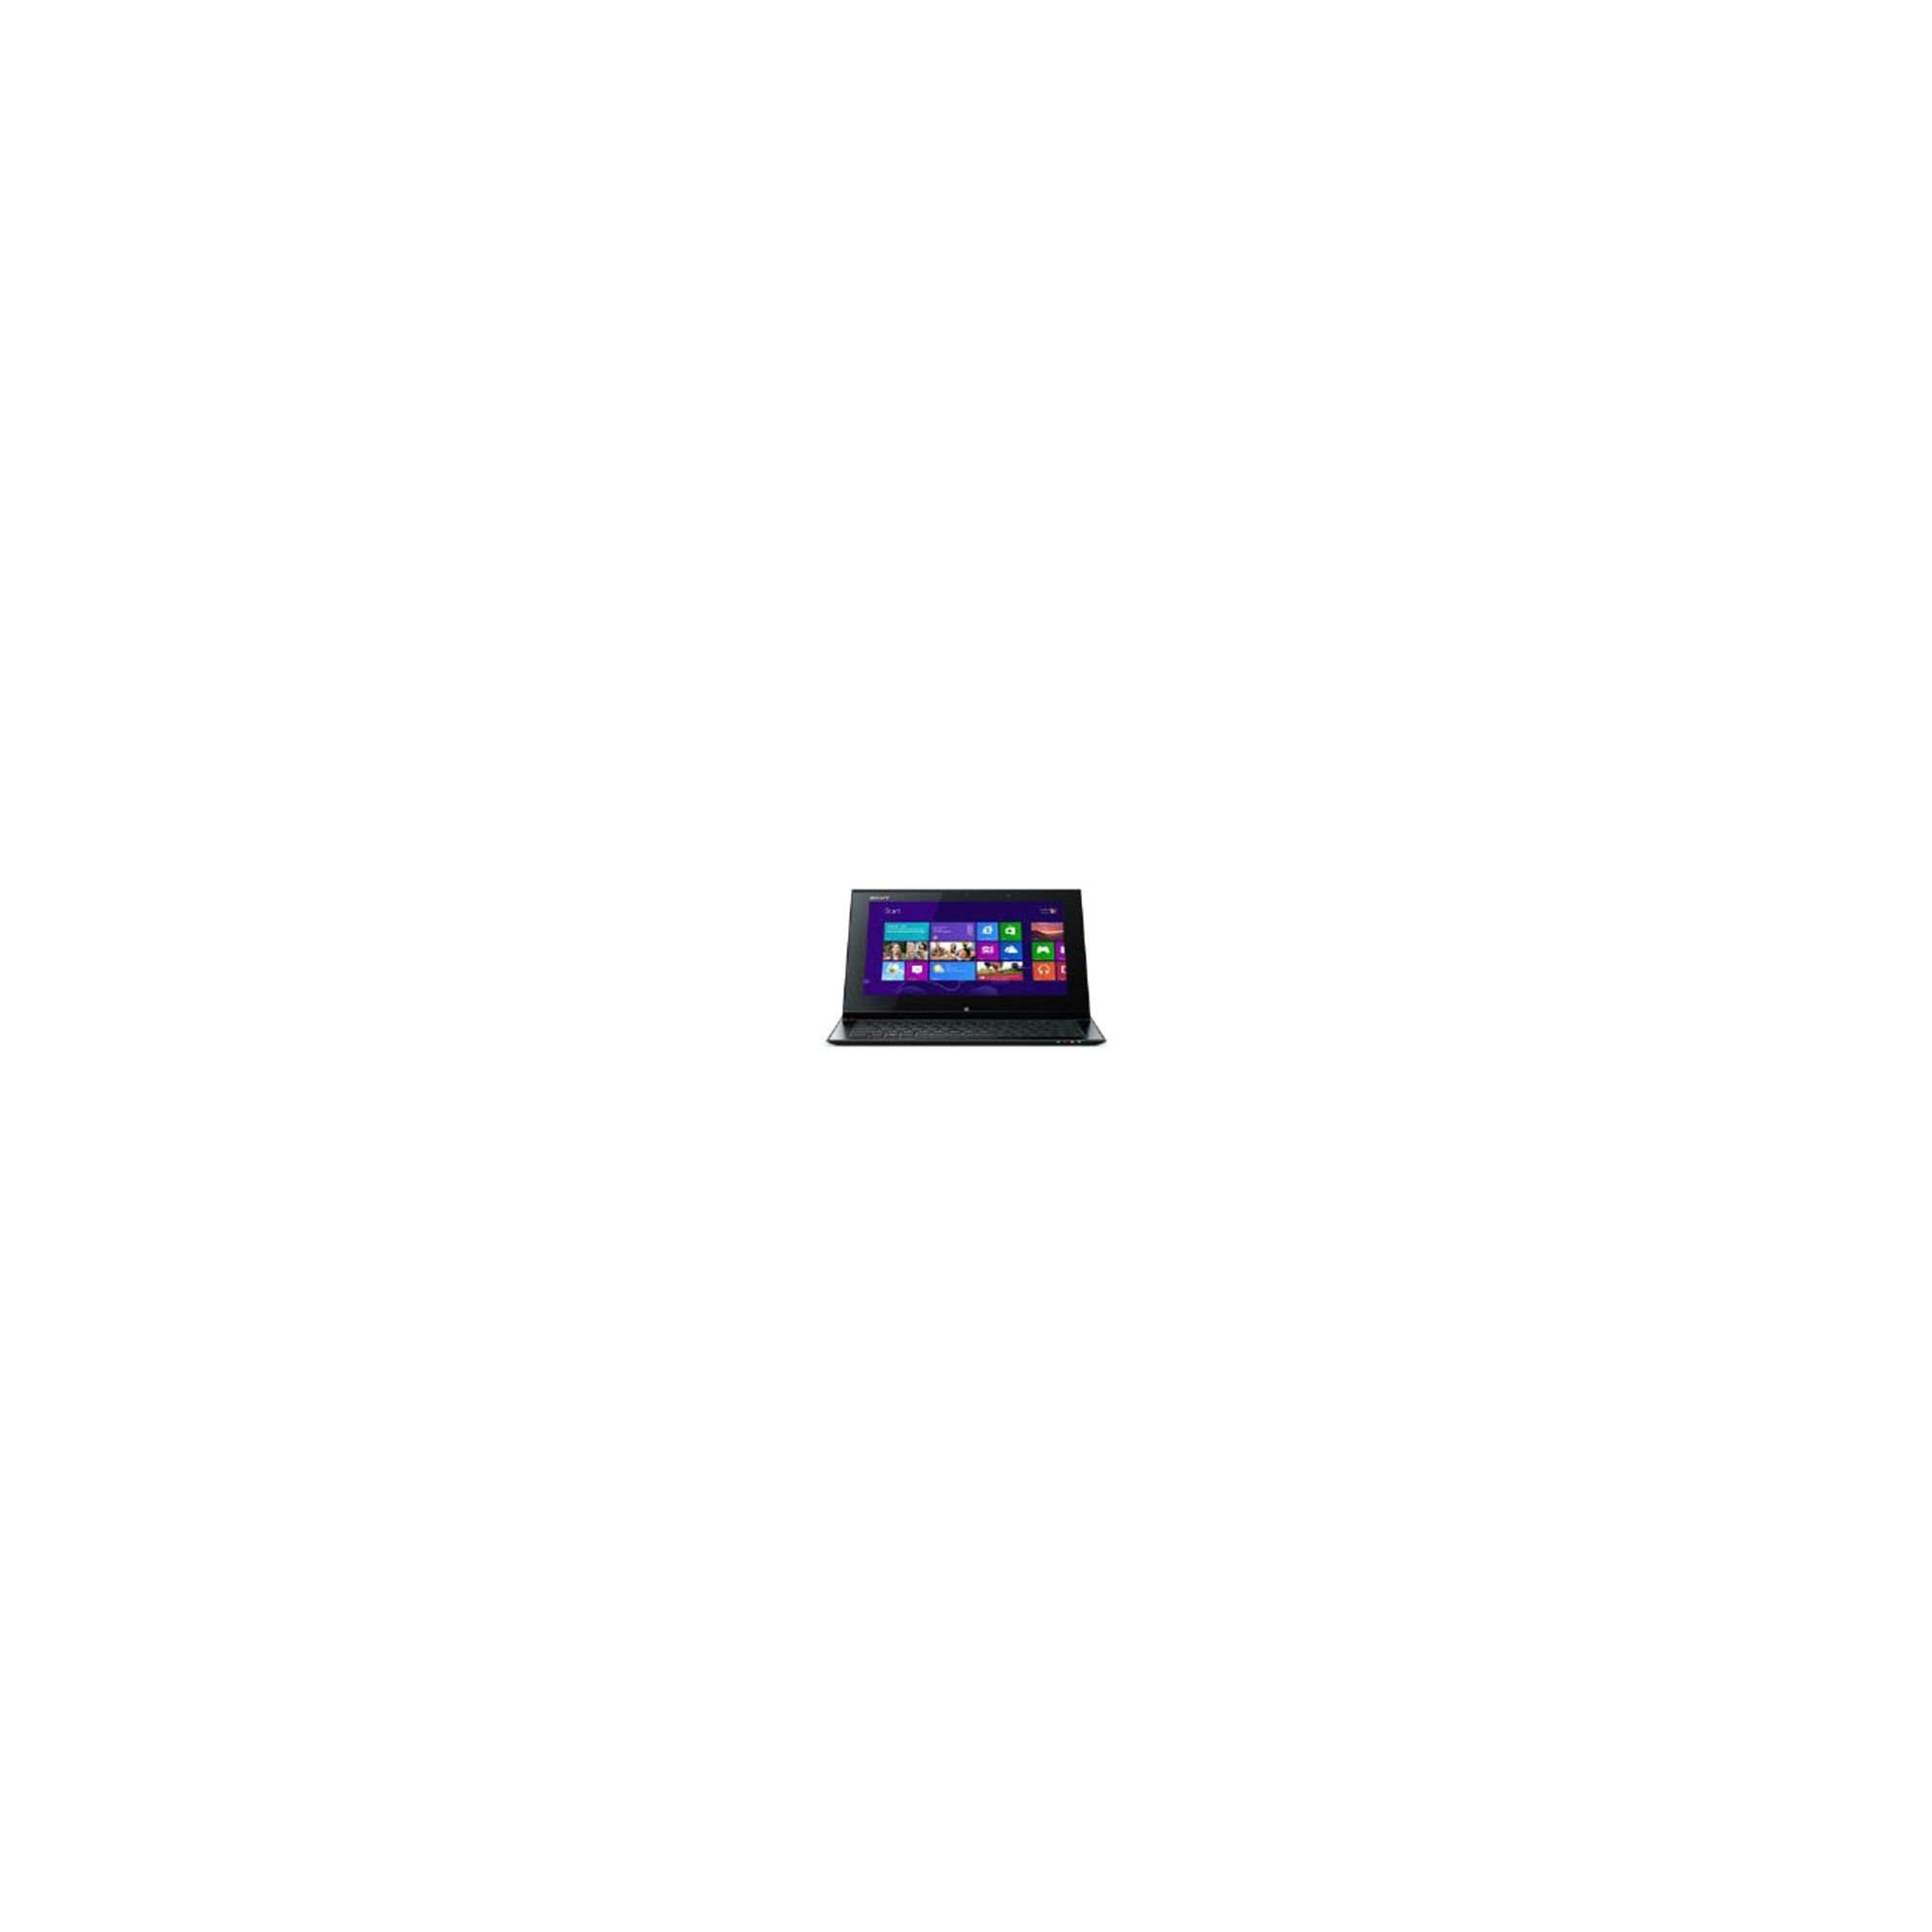 Sony Vaio Duo SVD1121Z9E (11.6 inch) Notebook Core i7 (3517U) 1.9GHz 8GB (4GB + 4GB) 256GB SSD WLAN BT Webcam Windows 8 Pro (HD Graphics 4000) at Tesco Direct